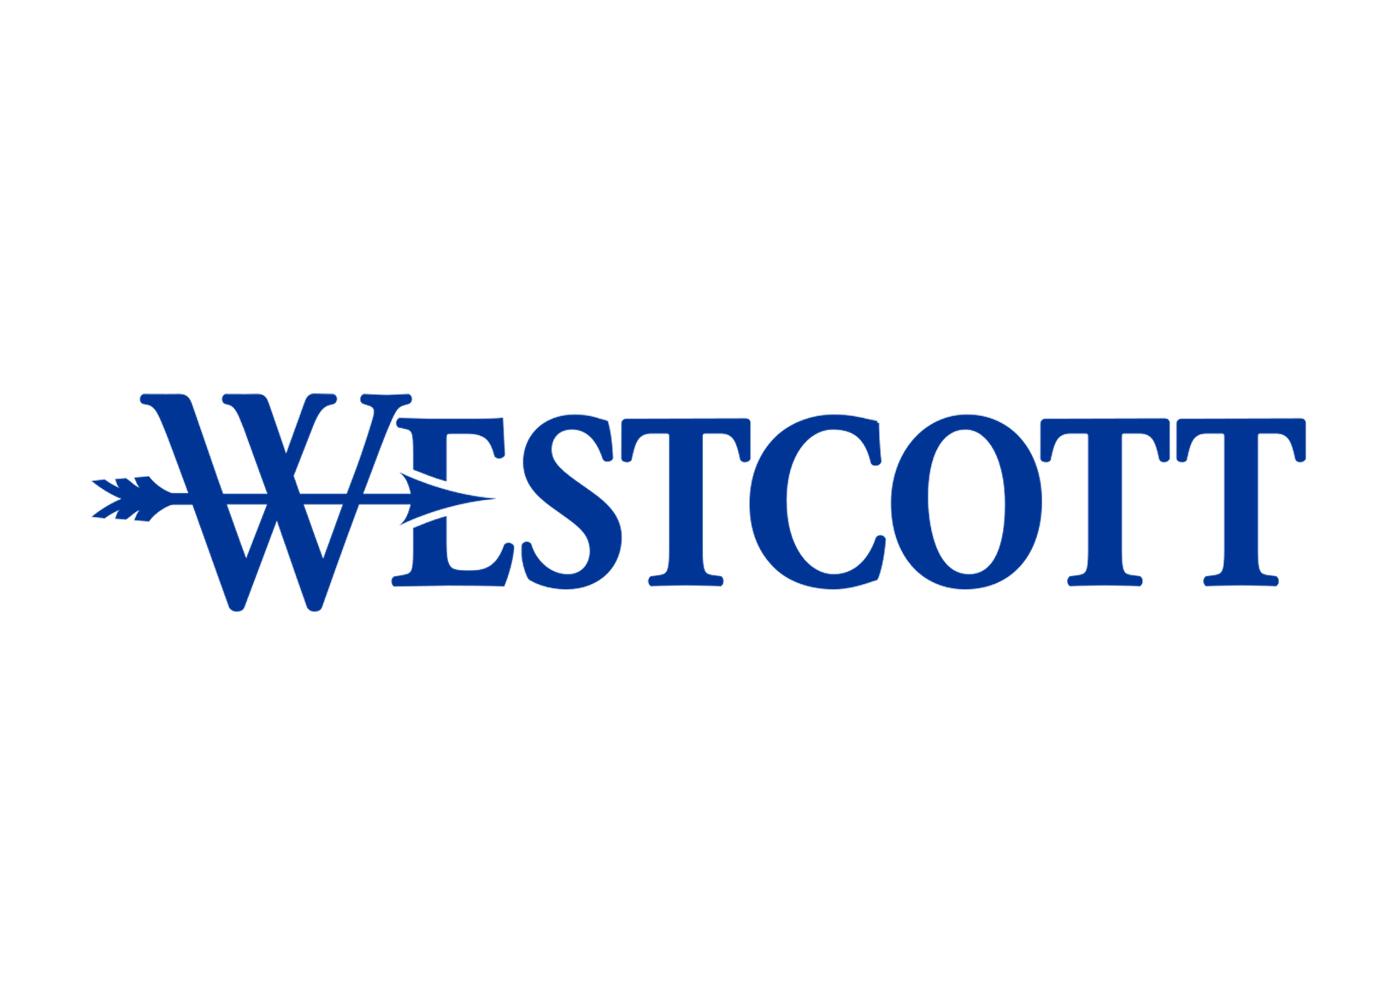 Westcott_Logo.jpg